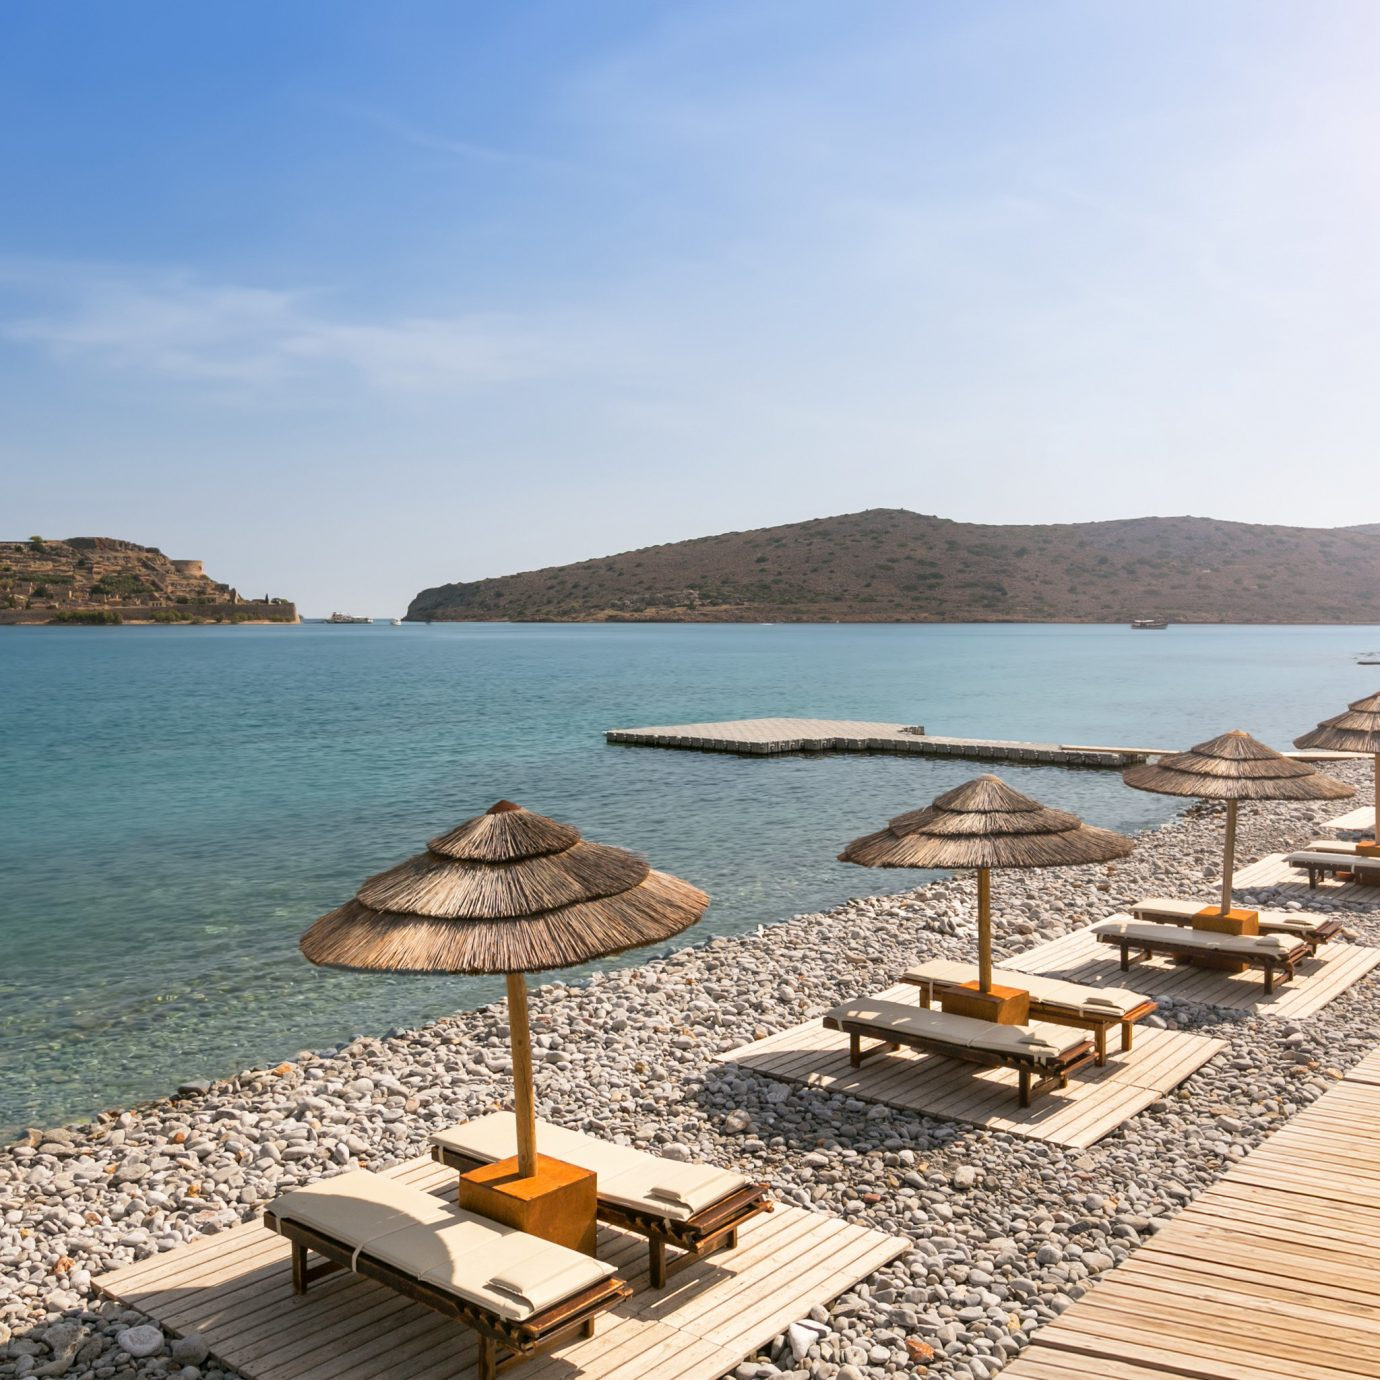 Hotels Romance sky water umbrella chair Beach Sea shore Coast Nature Ocean overlooking cape cove Resort marina dock Island set